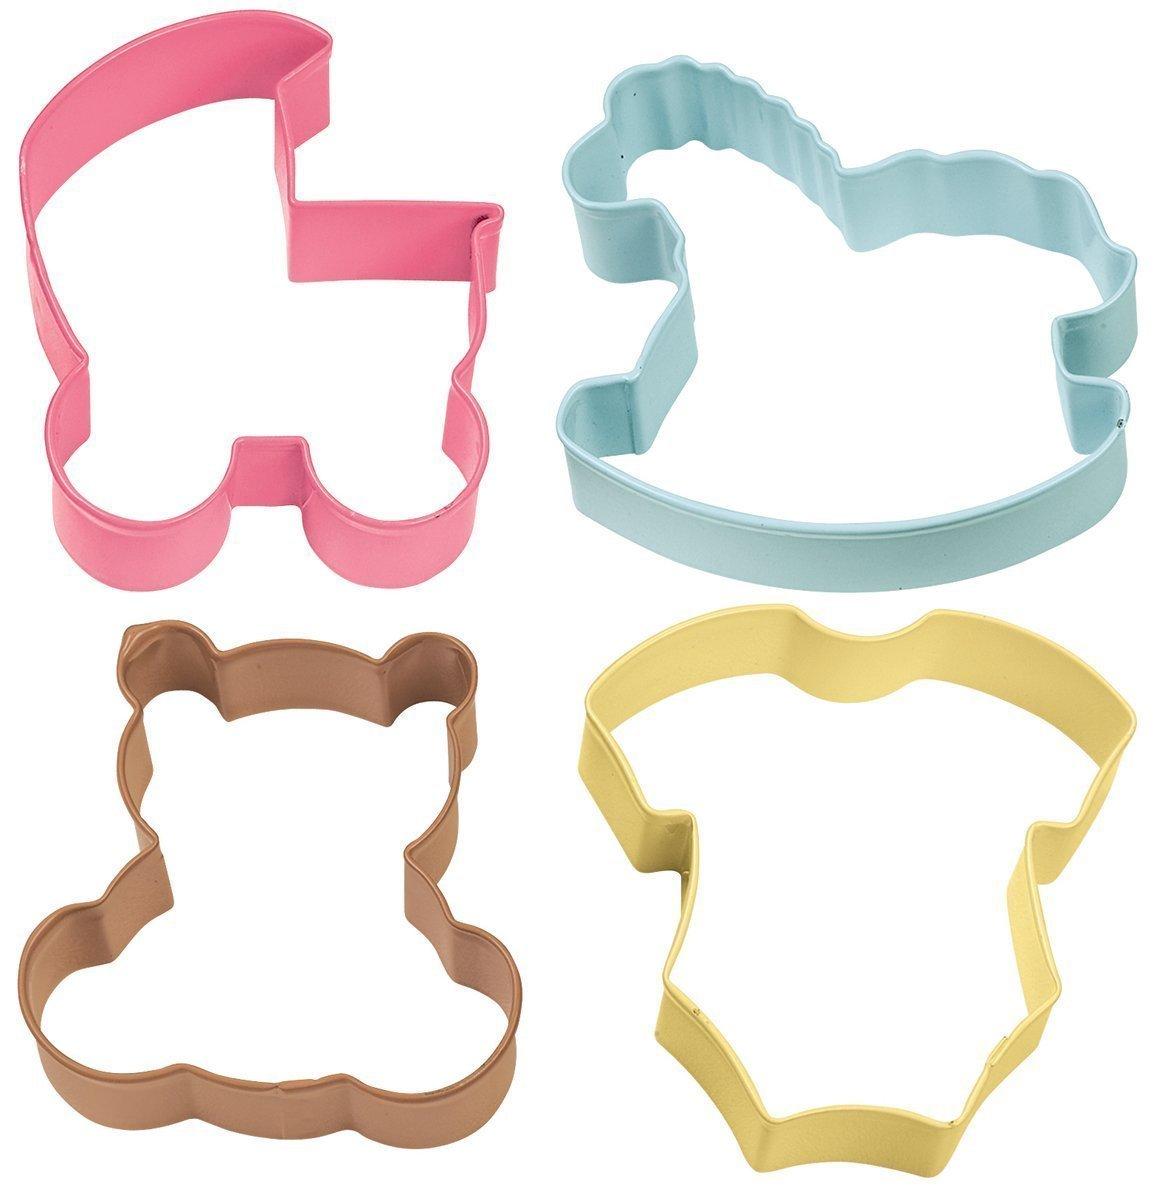 Wilton Cookie Cutter Set of 4 -BABY -PRAM, ROCKING HORSE, TEDDY, ONESIE - Σετ 4τεμ κουπ πατ Μωρό - Καρότσι, φορμάκι, κουνιστό αλογάκι, αρκουδάκι 7.6εκ